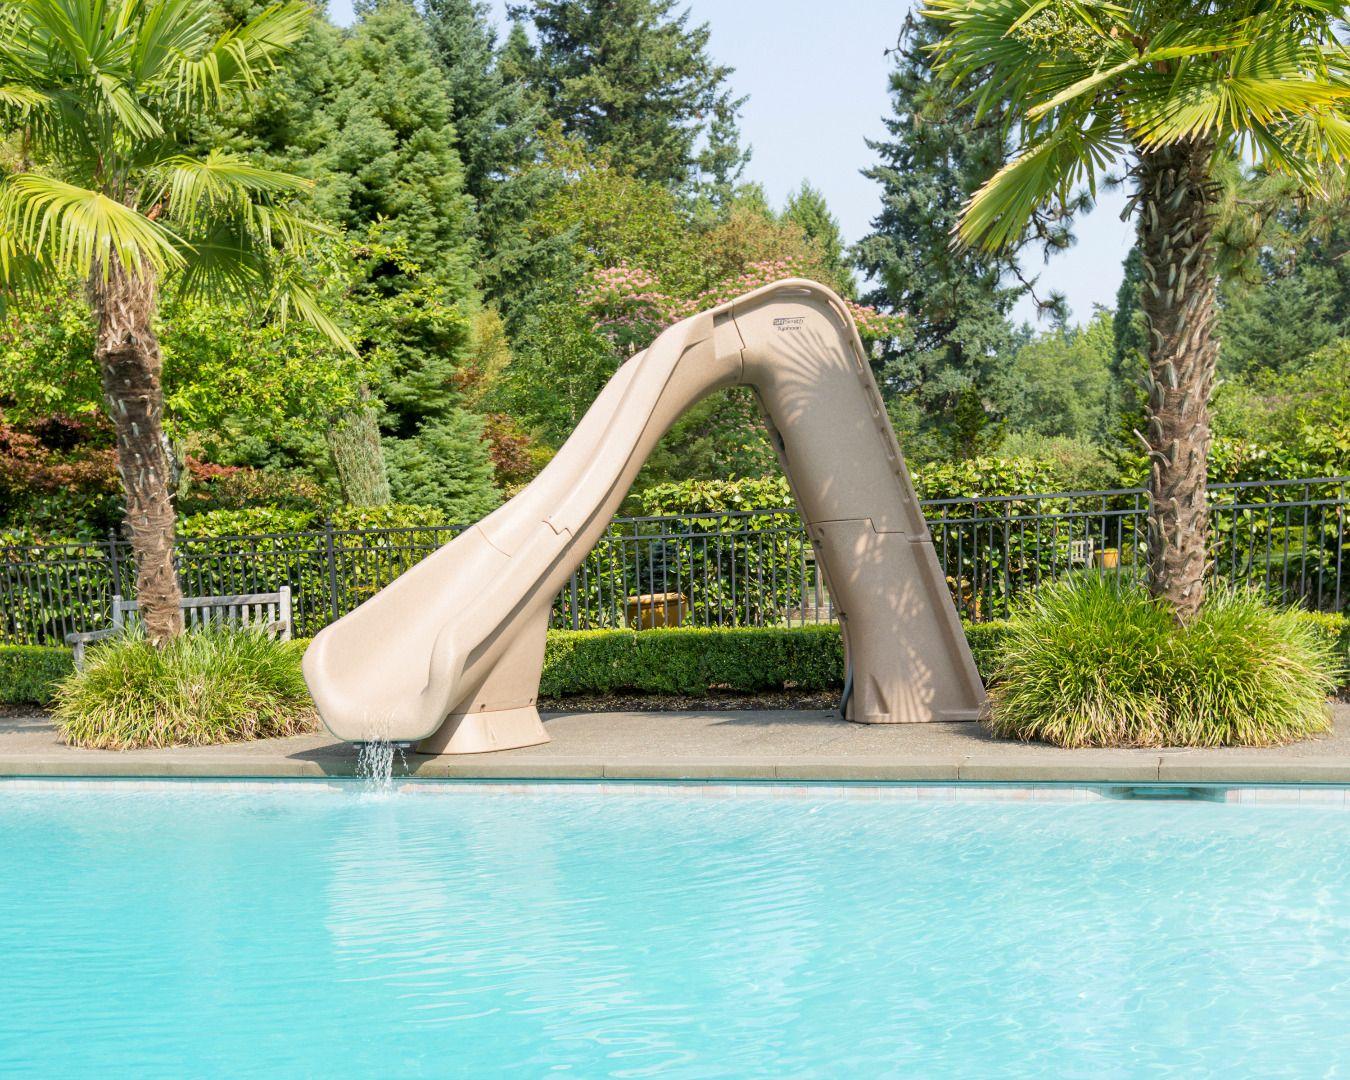 S R Smith 670 209 58223 Typhoon Left Curve Pool Slide Sandstone In 2020 Inground Pool Slides Swimming Pool Designs Swimming Pool Slides